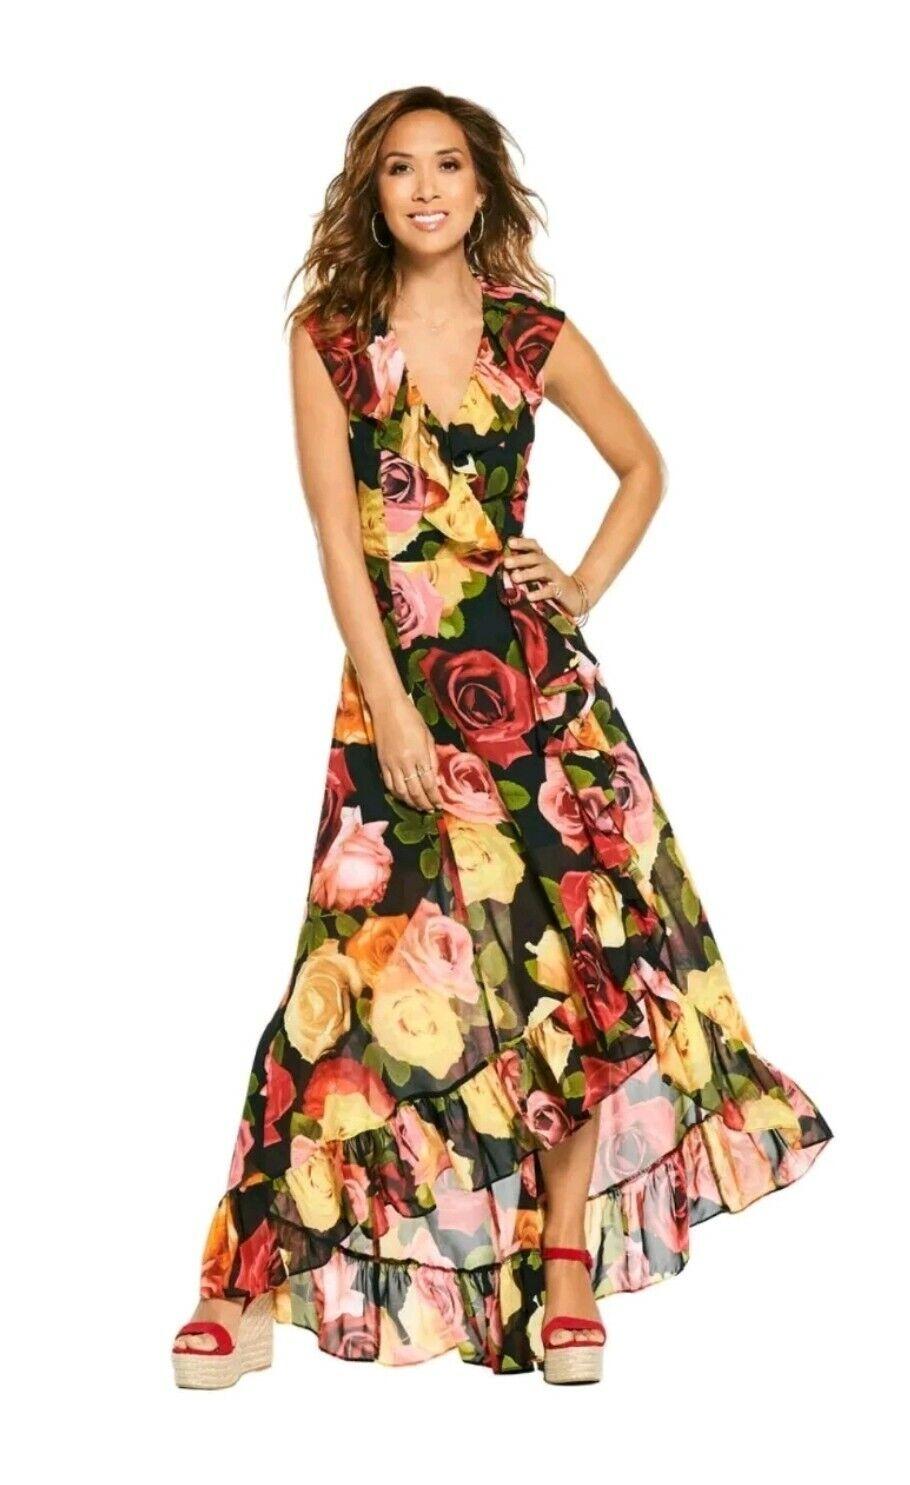 Myleene klass Floral long to the floor dress BNWT Sleeveless